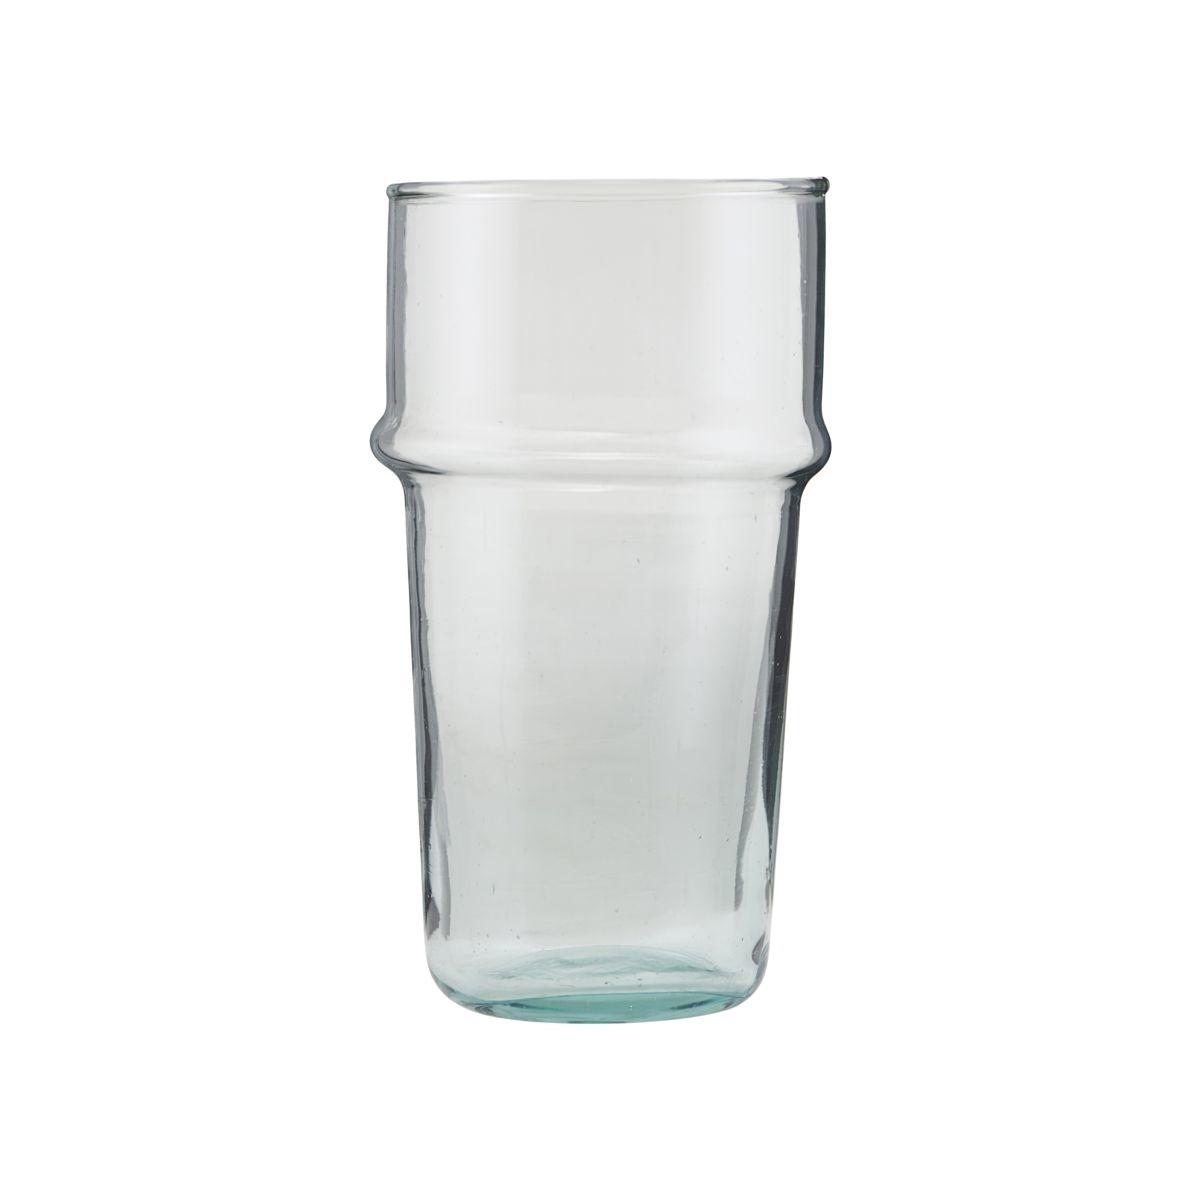 House Doctor Mynta Glas - Blue / Green - 12cm - House Doctor